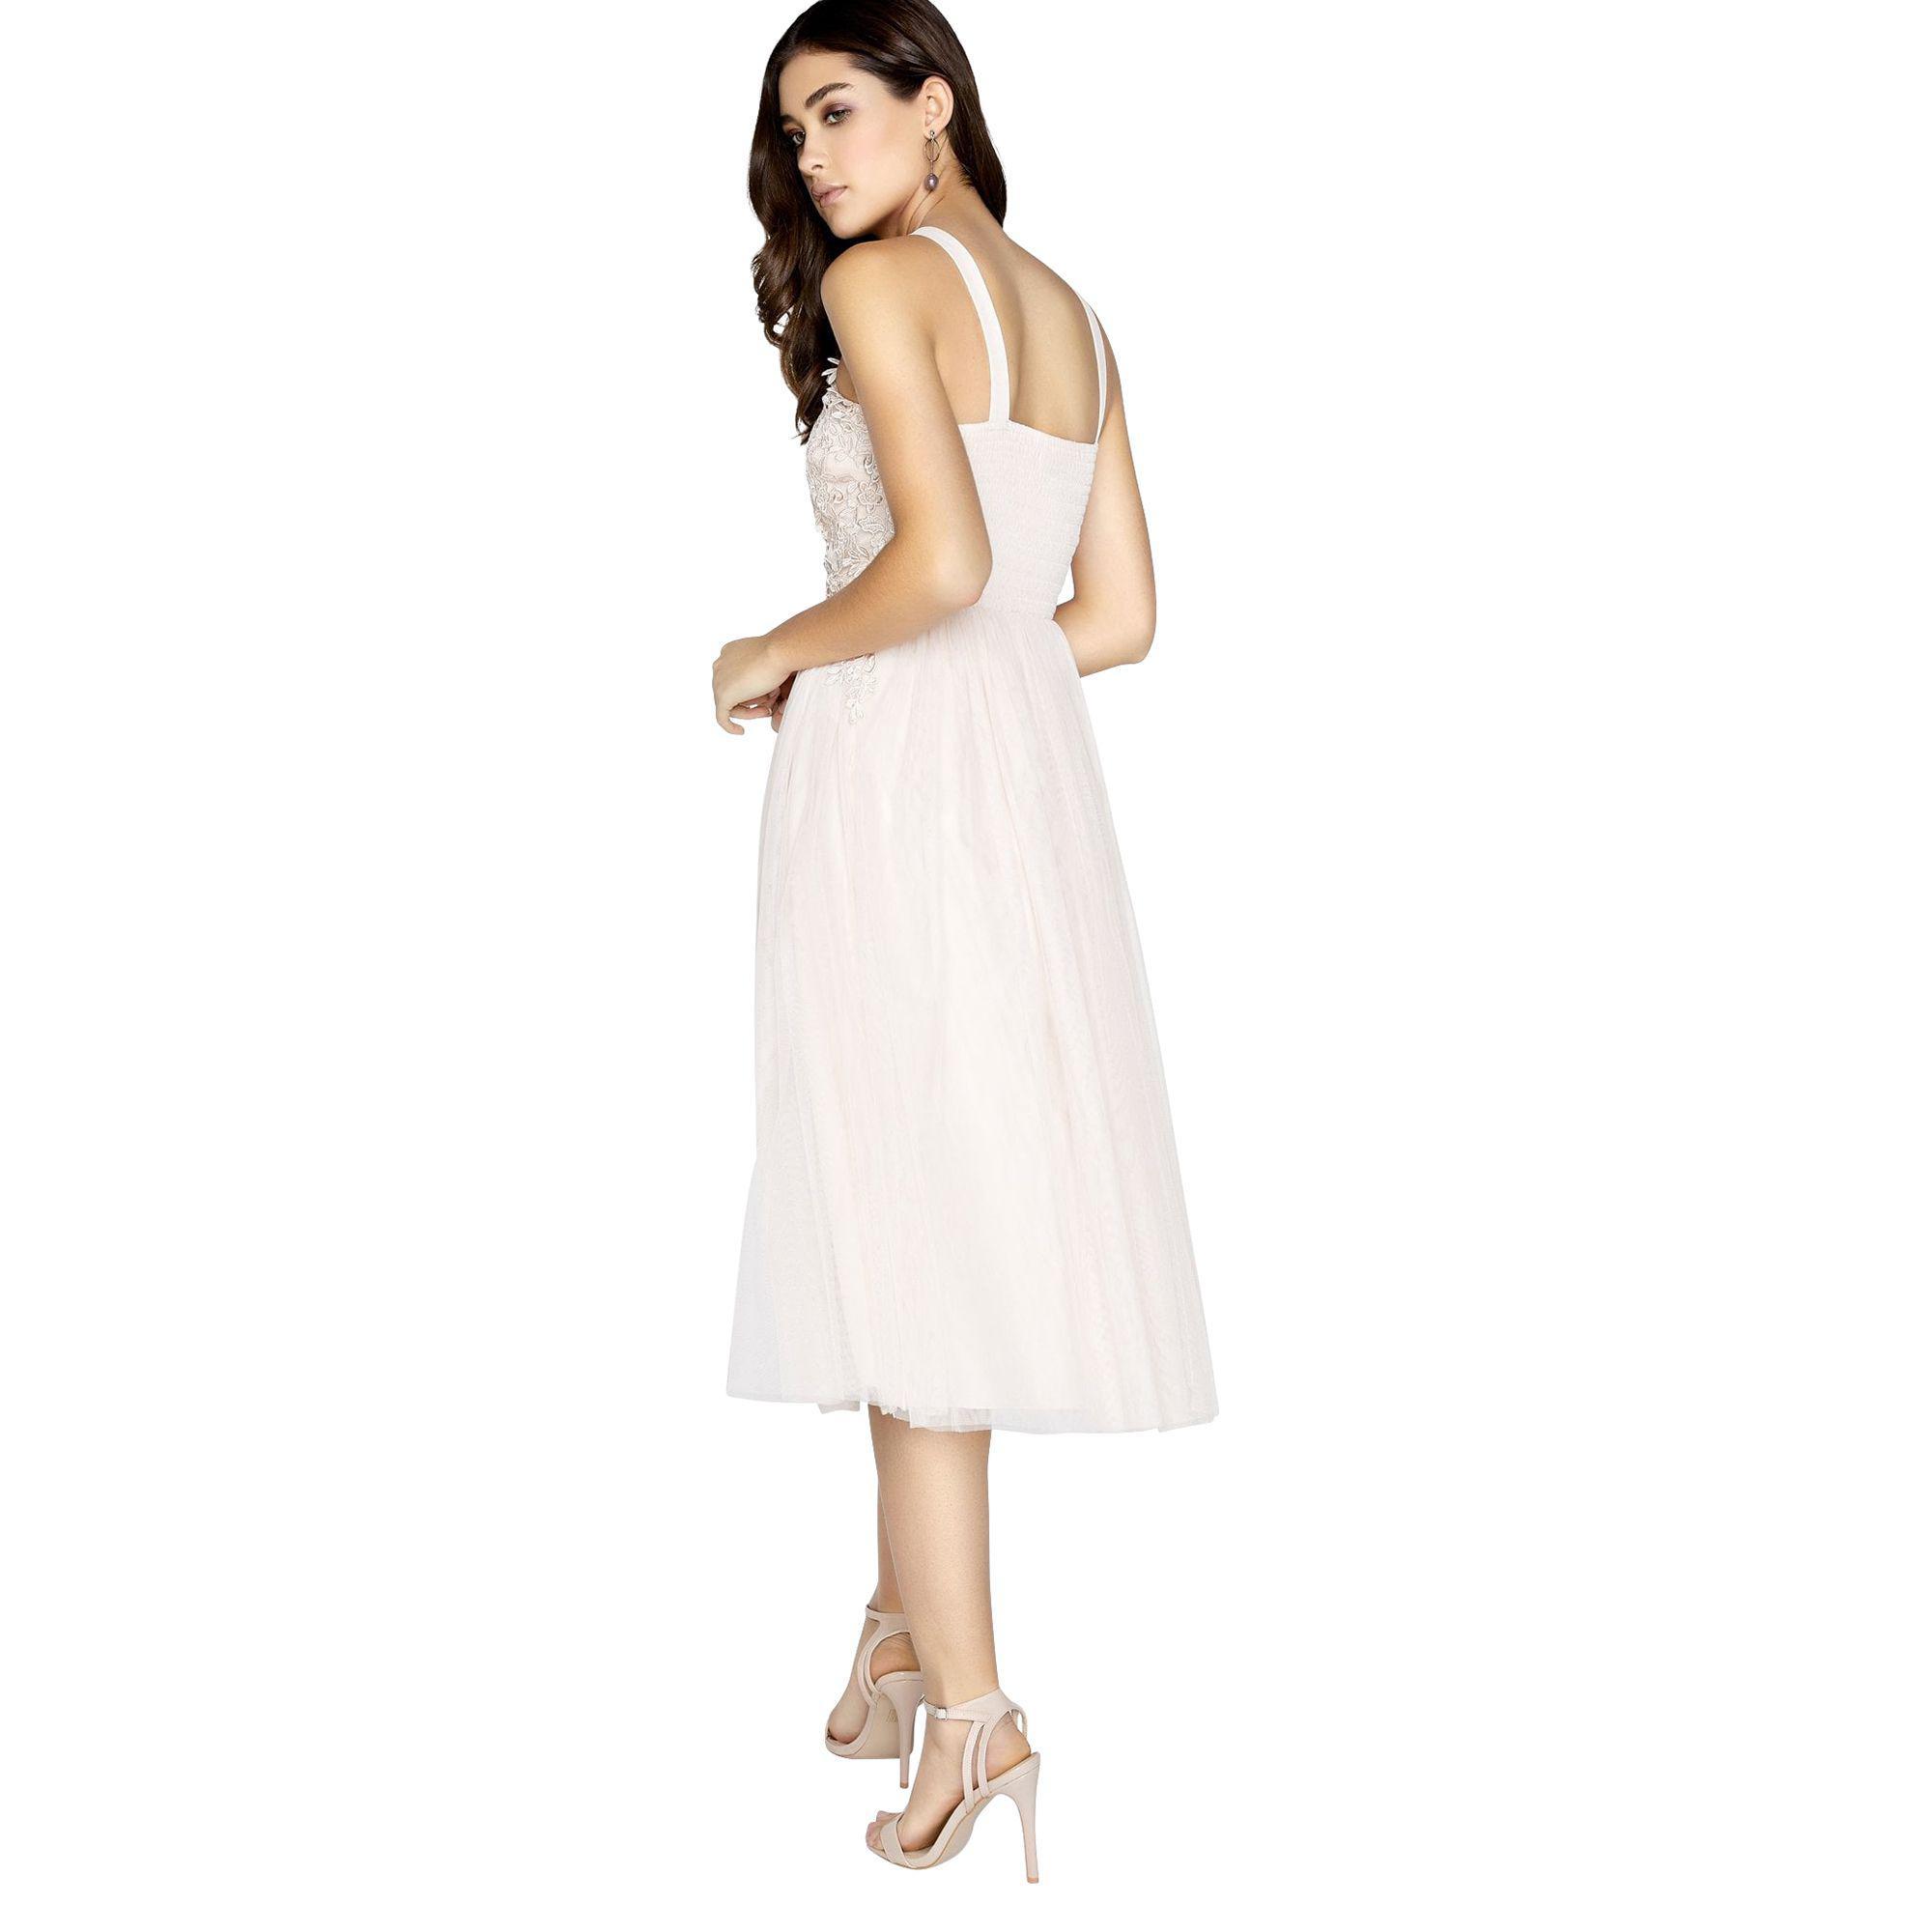 82be22bc8d40c Little Mistress - Natural Summer Floral Applique Prom Dress - Lyst. View  fullscreen